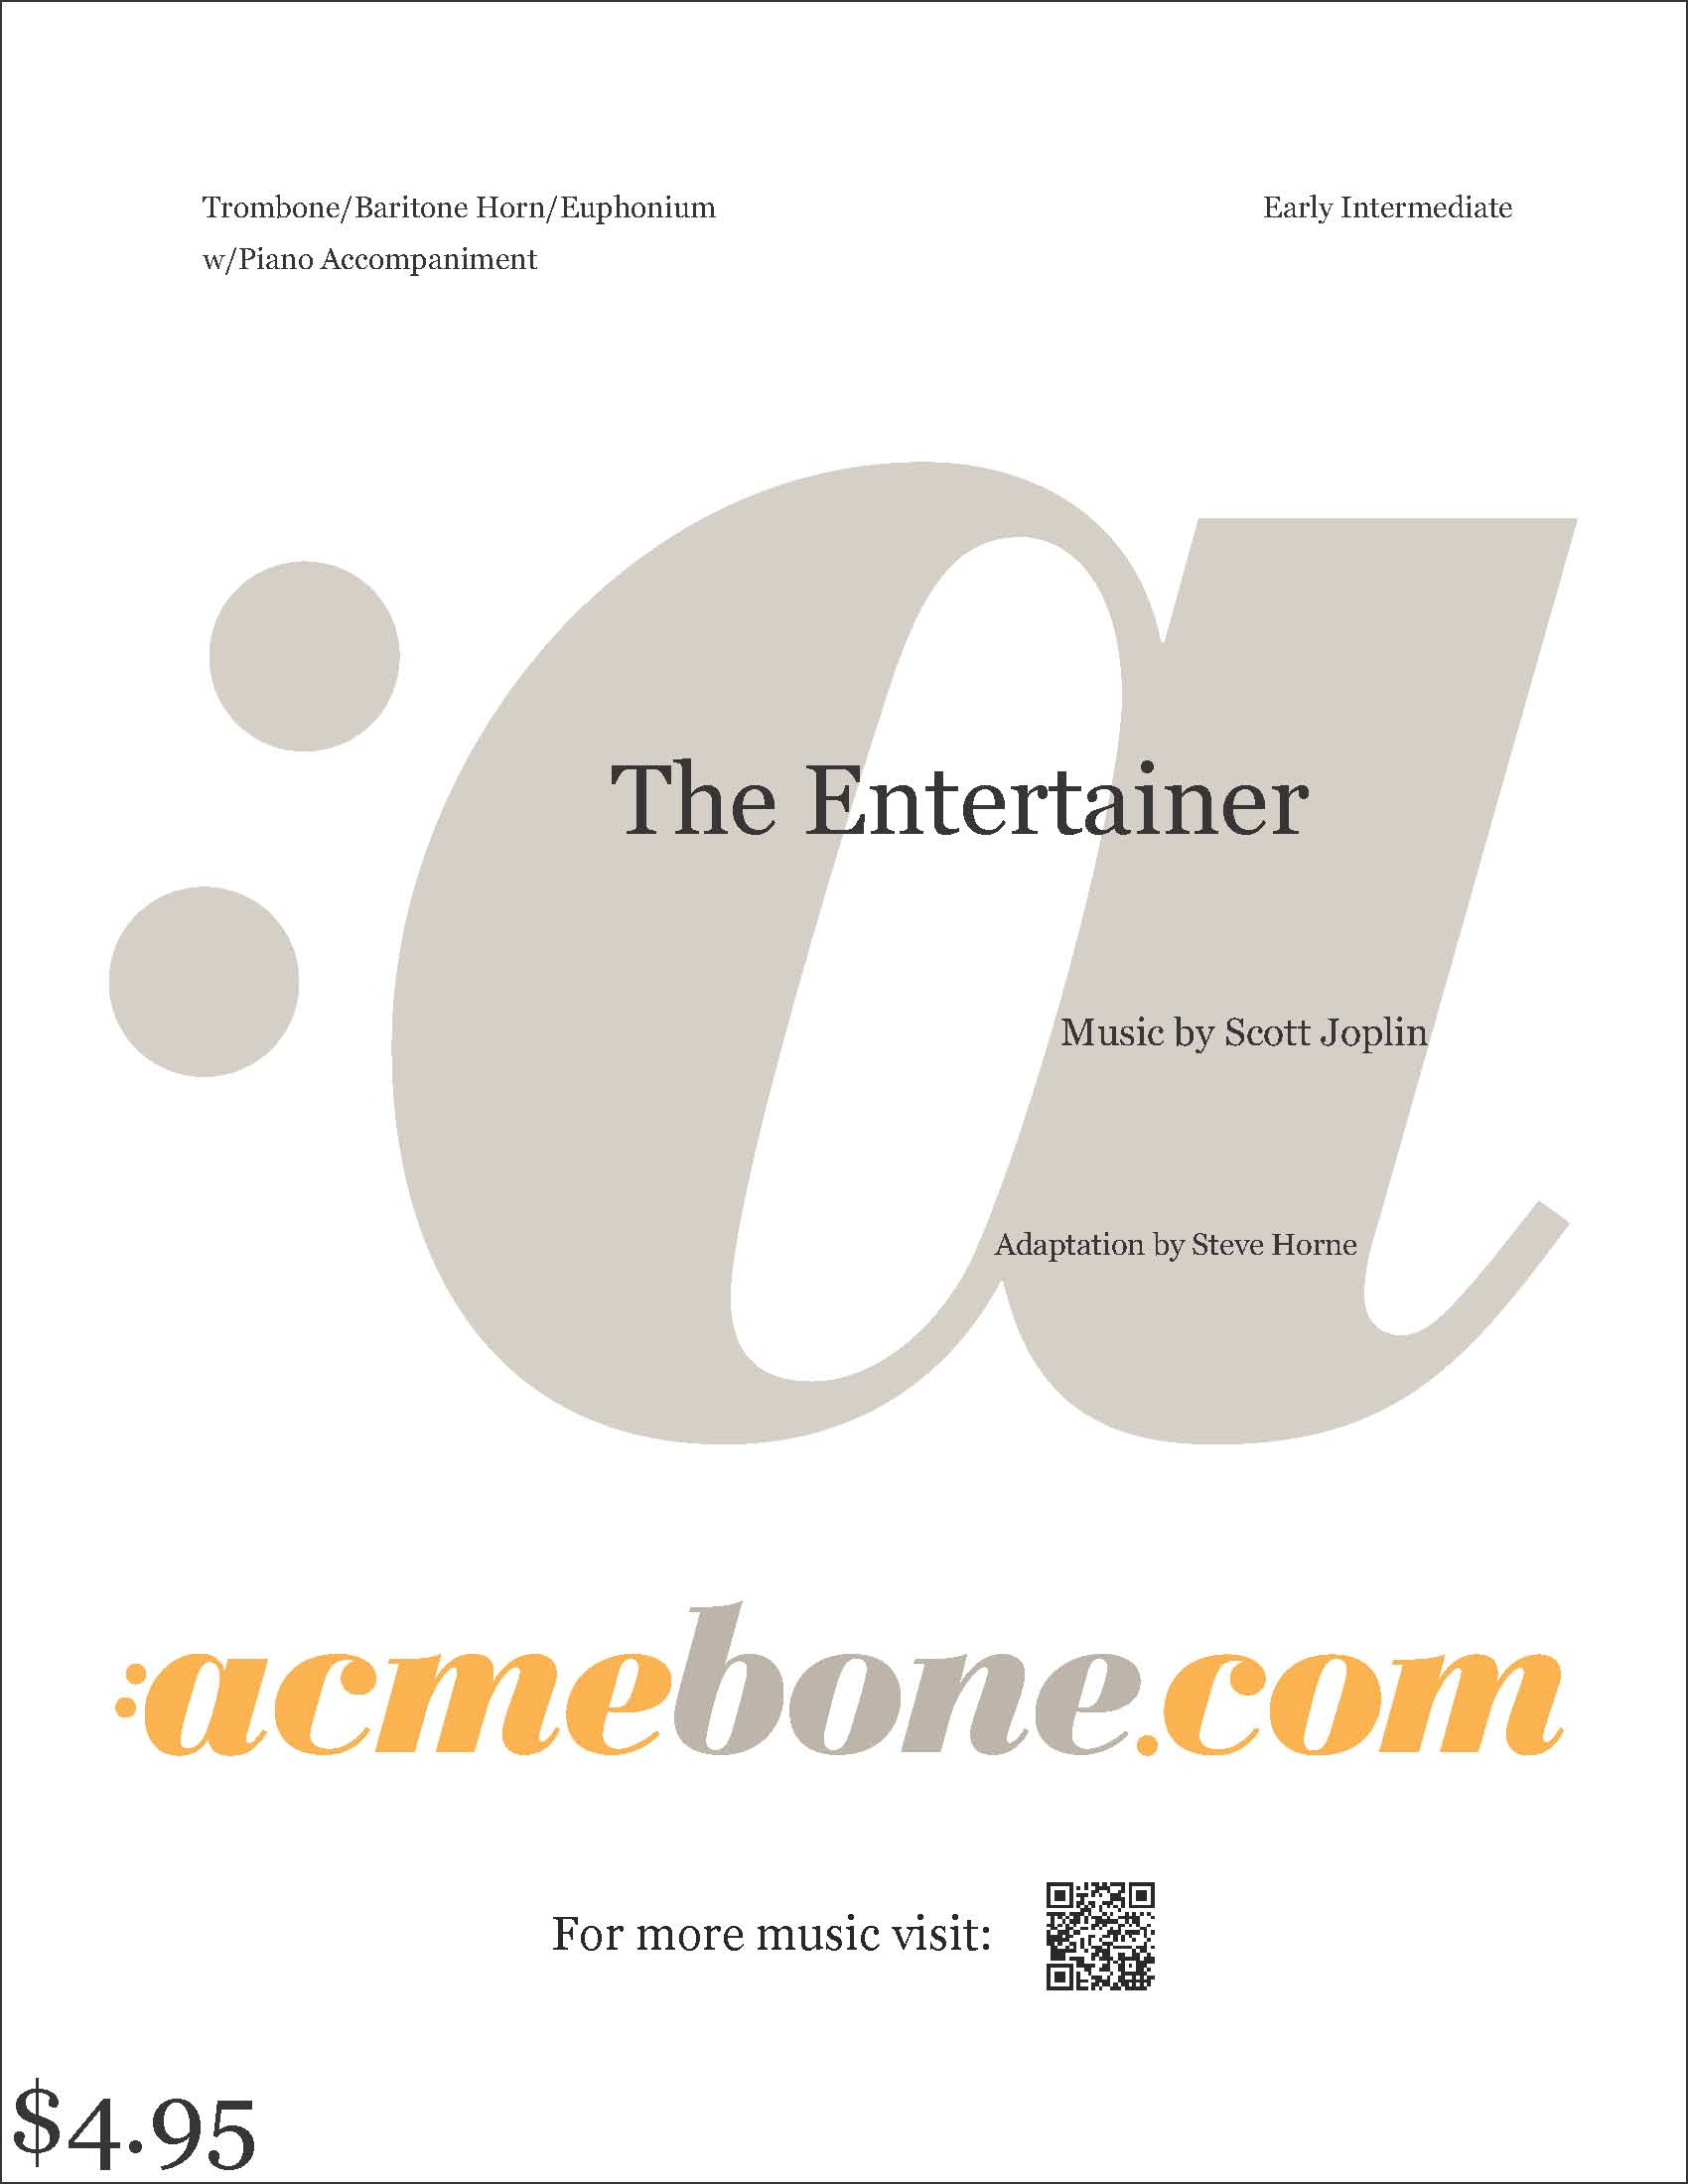 The Entertainer_digital_cover_w-bo_price.jpg